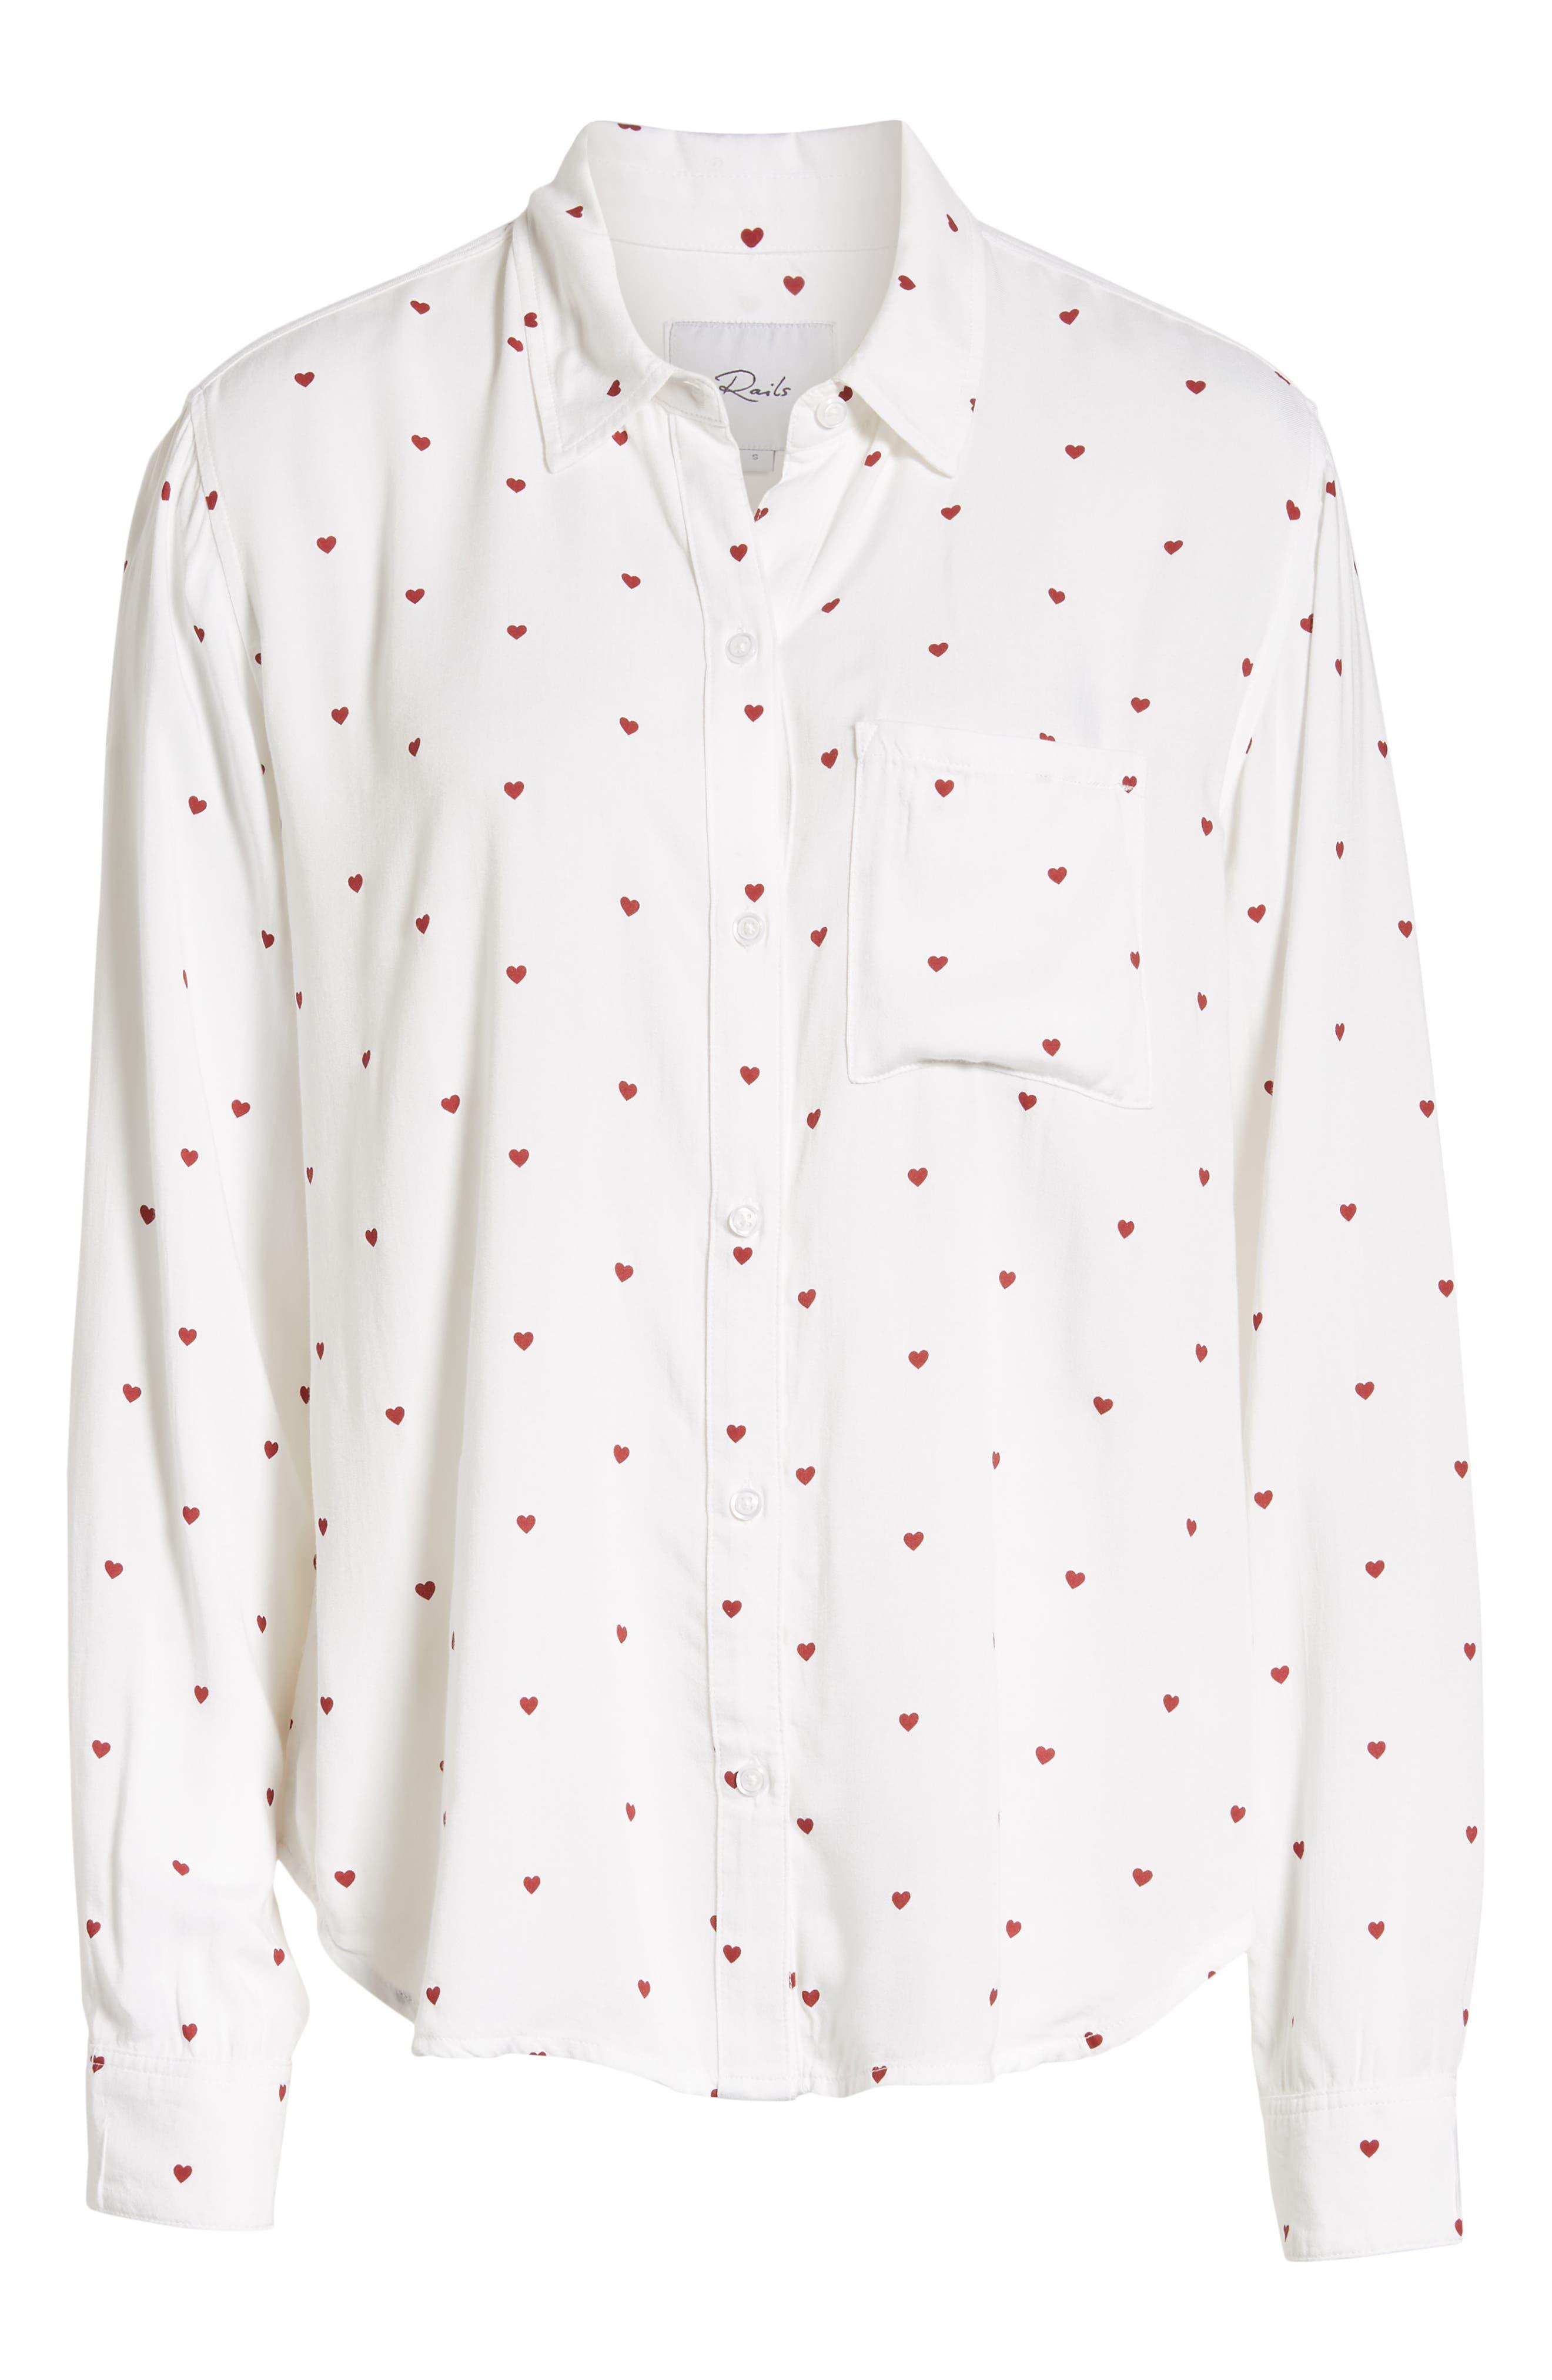 Rocsi Heart Print Shirt,                             Alternate thumbnail 6, color,                             WHITE RED HEARTS